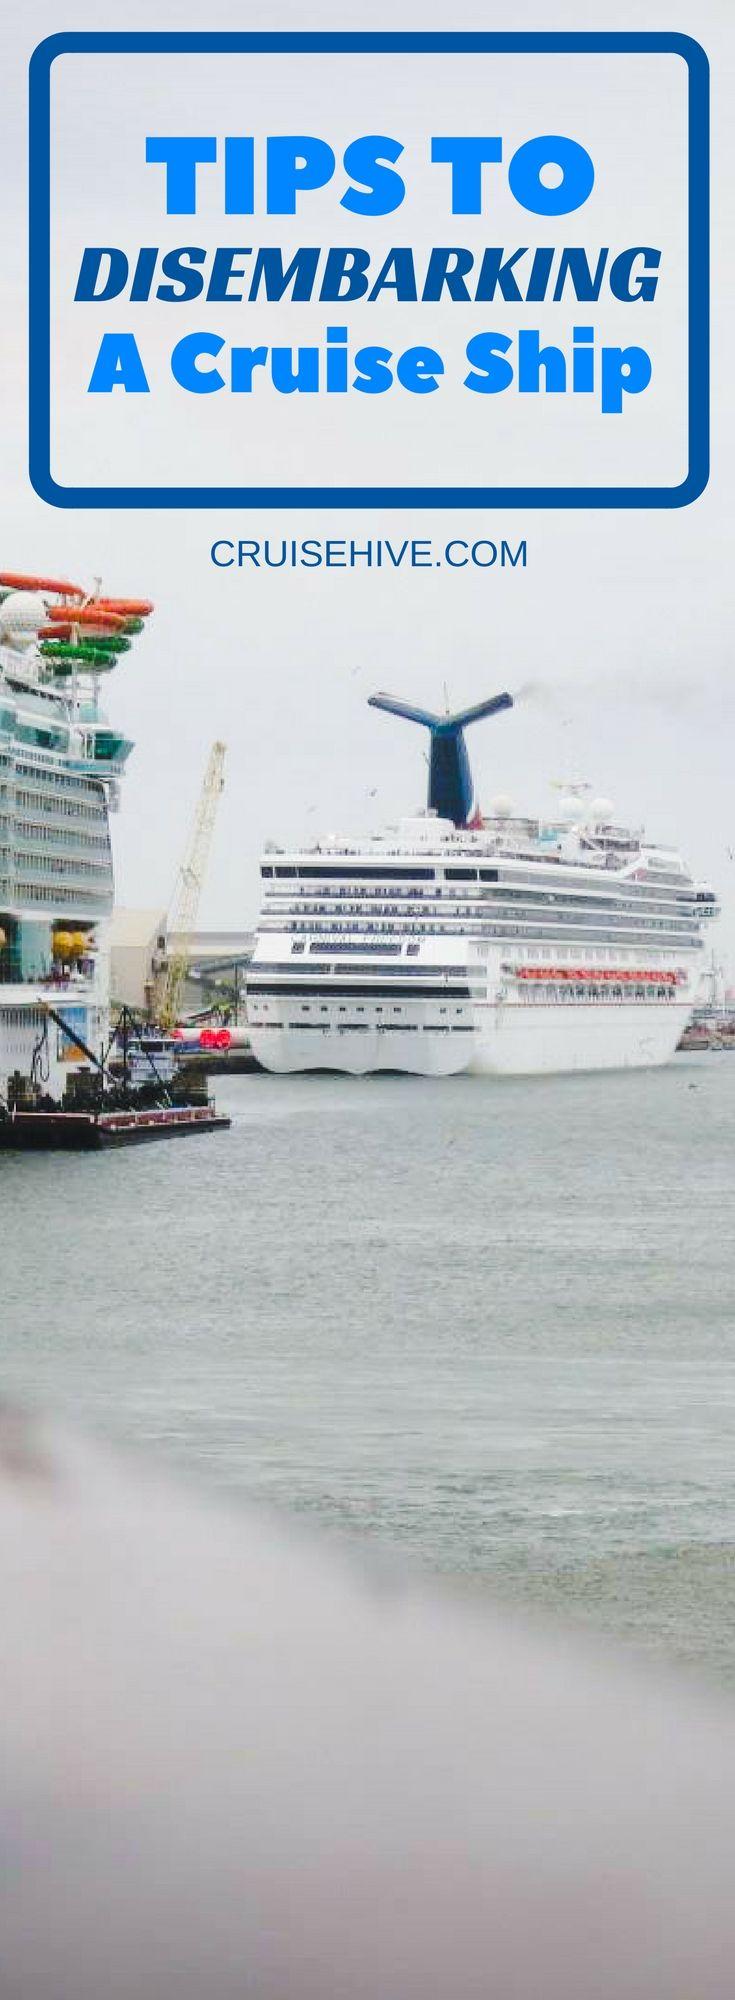 Tips To Disembarking A Cruise Ship Cruise Ship Cruise Travel Cruise